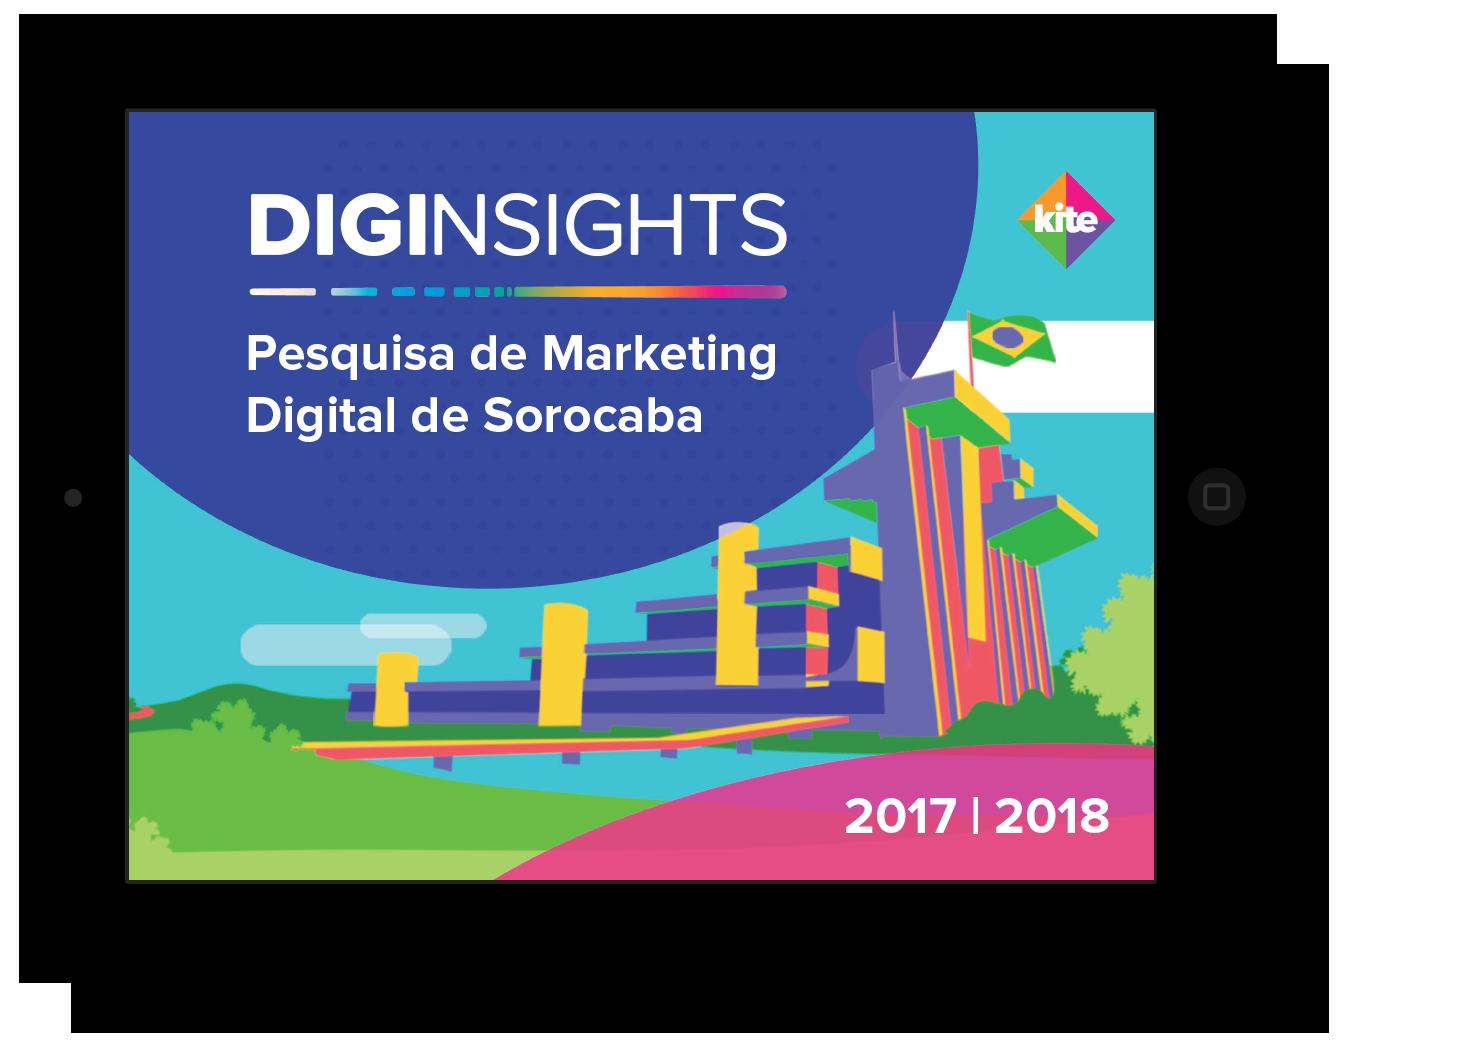 Pesquisa de Marketing Digital de Sorocaba